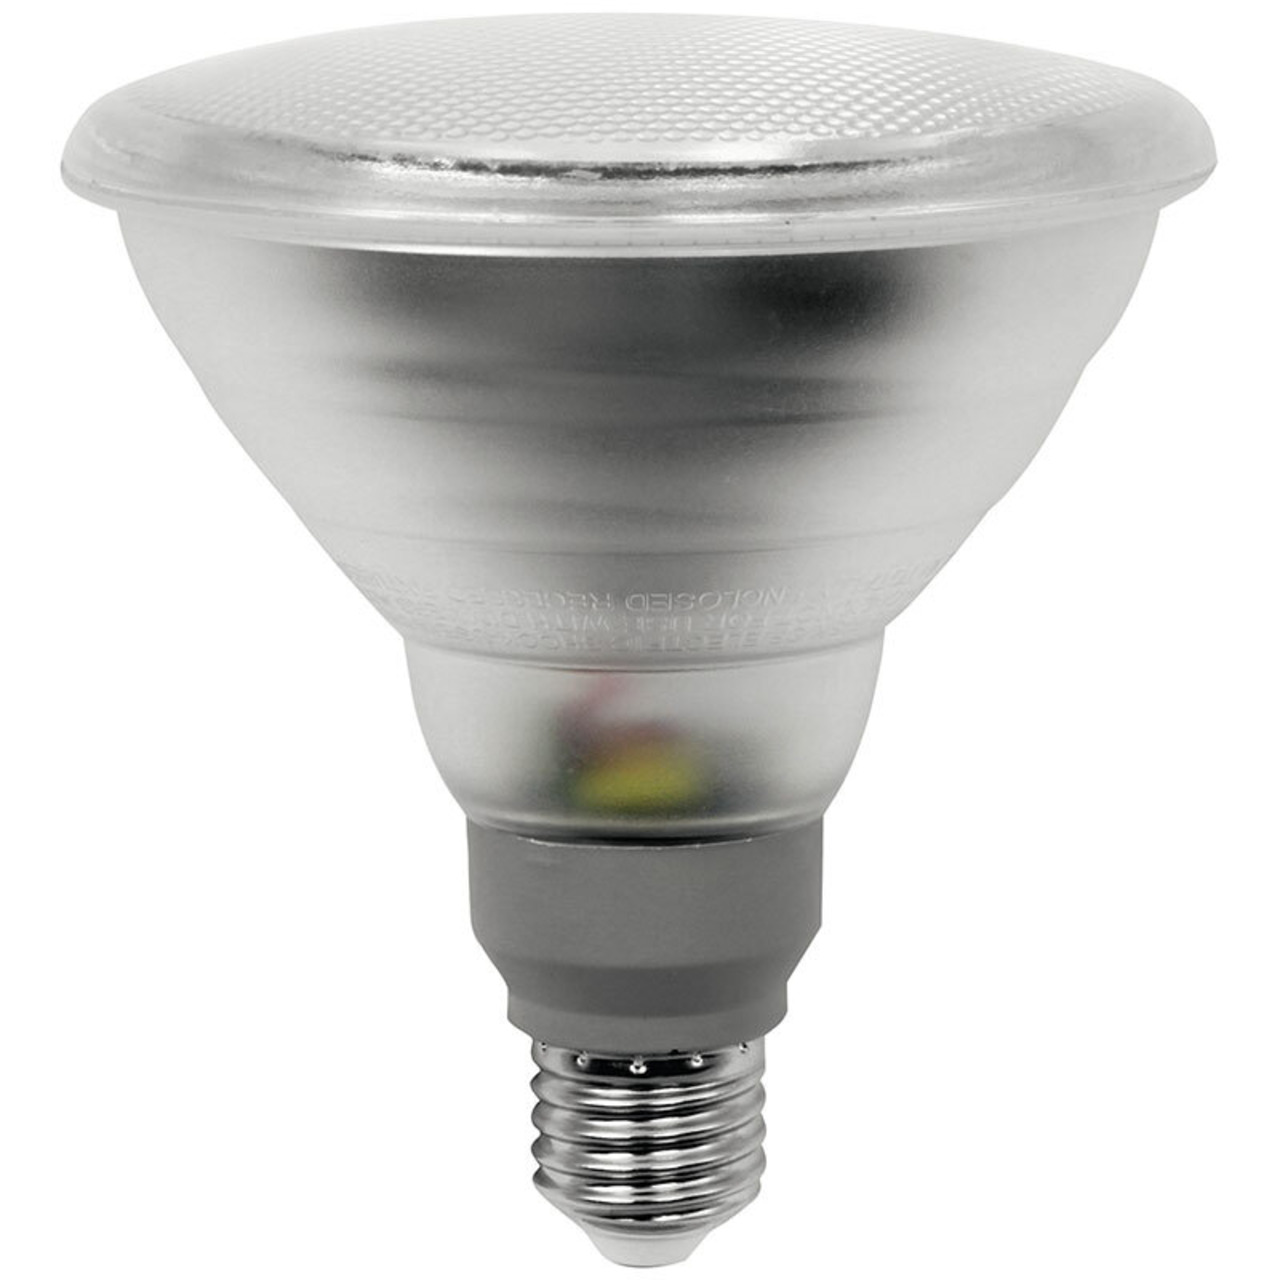 Lightme 12-W-PAR38-LED-Lampe E27- neutralweiss- IP55